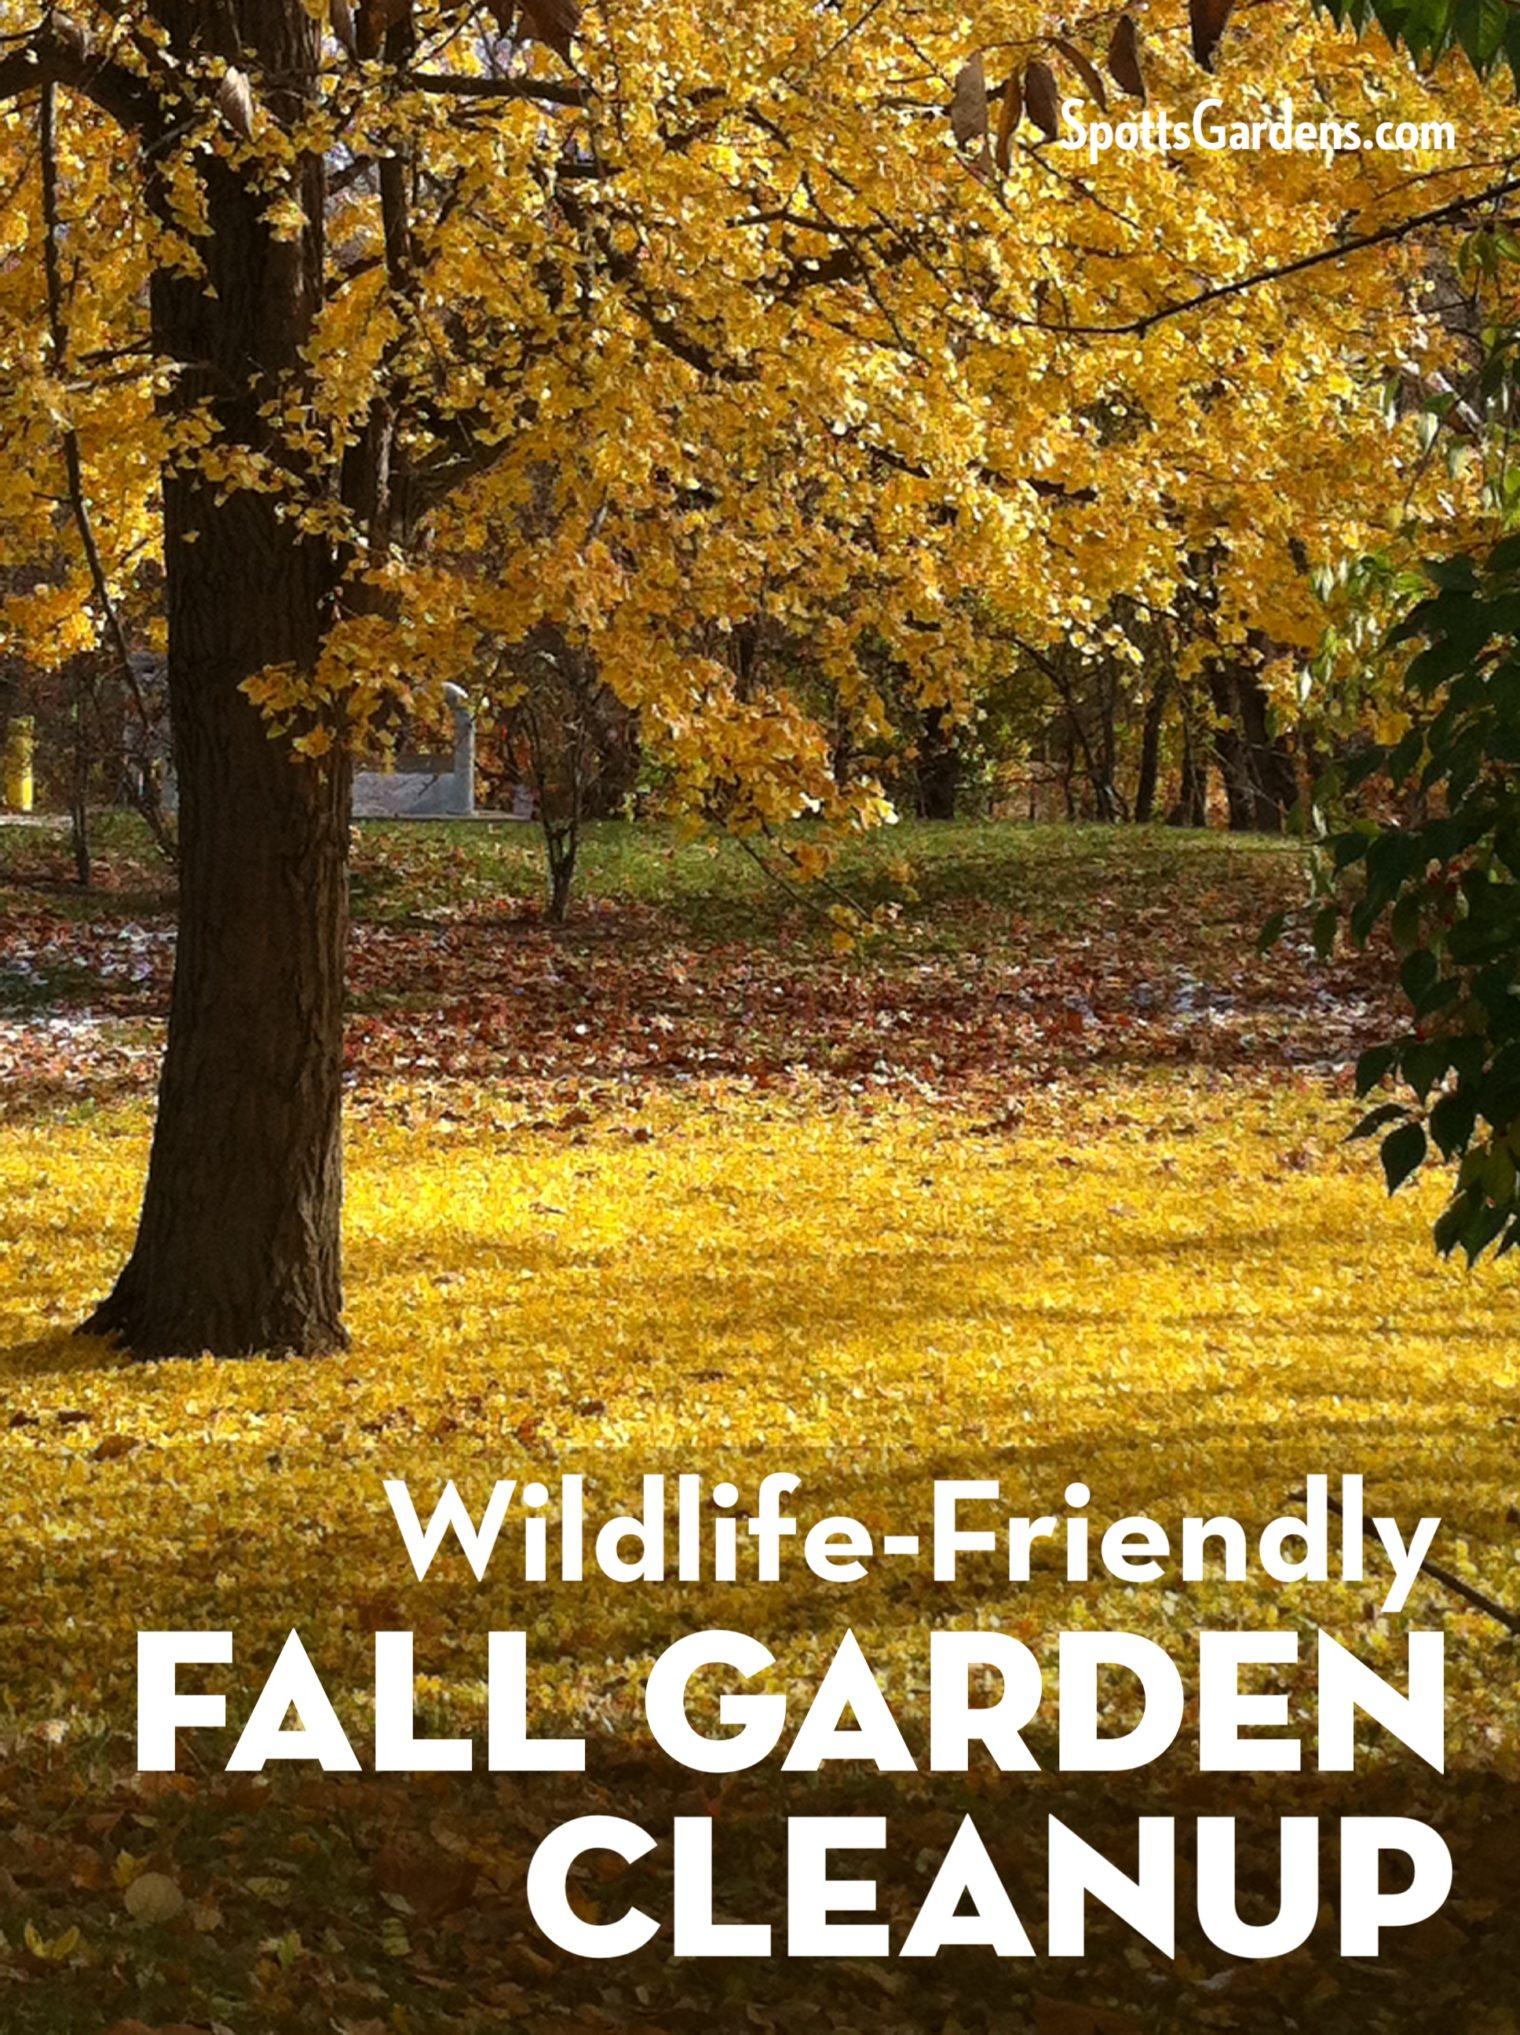 Wildlife-Friendly Fall Garden Cleanup